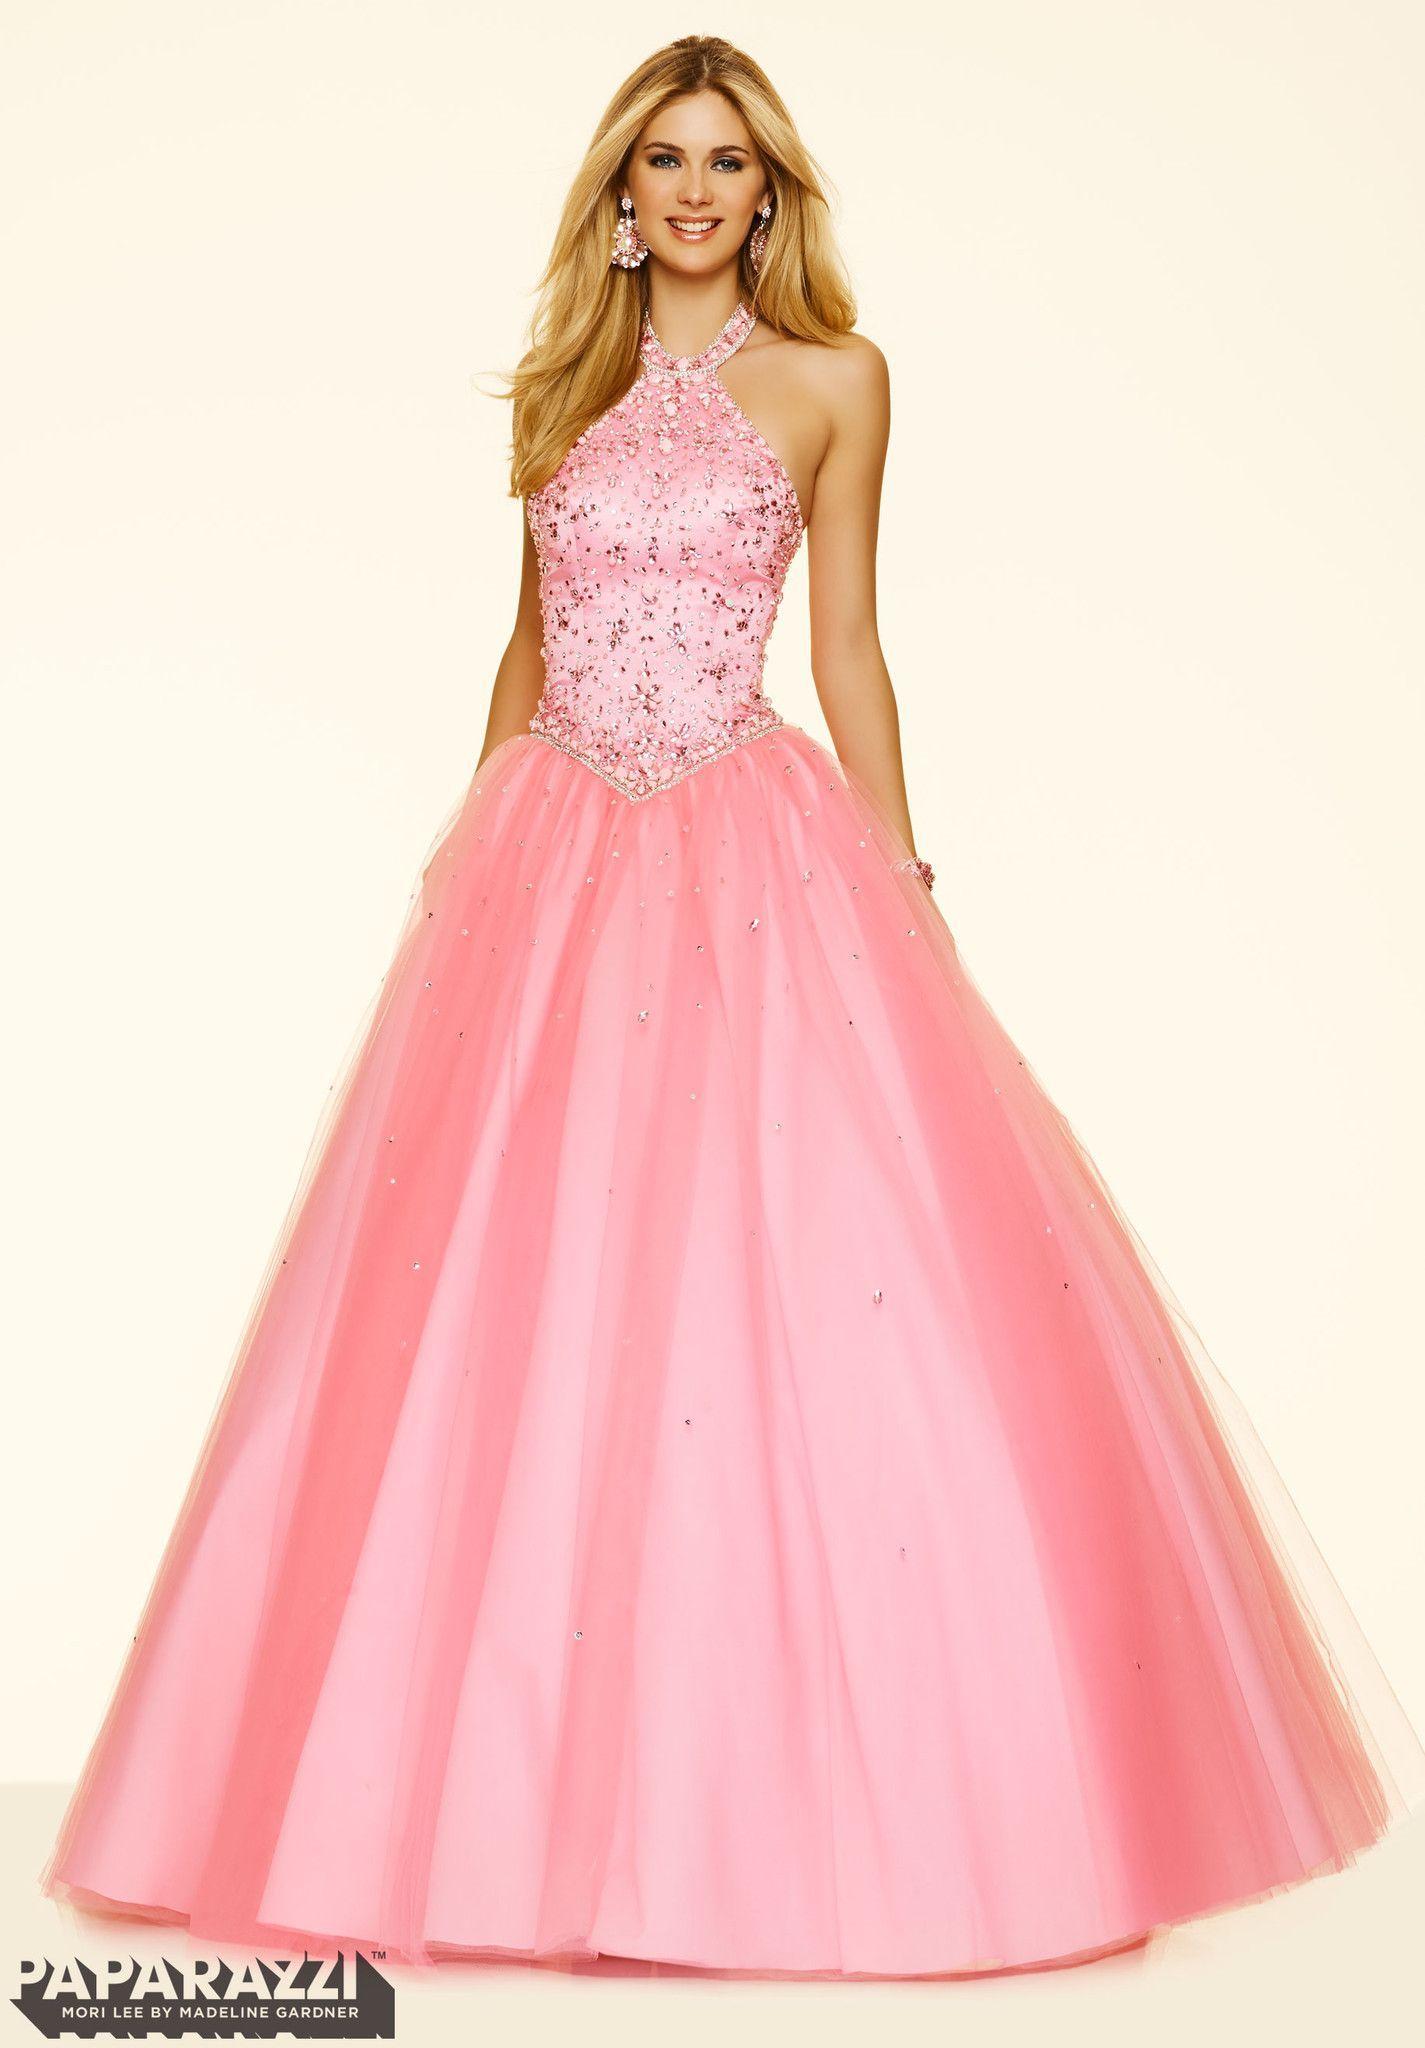 Mori Lee Paparazzi 98065 | Vestidos de baile largos | Pinterest ...